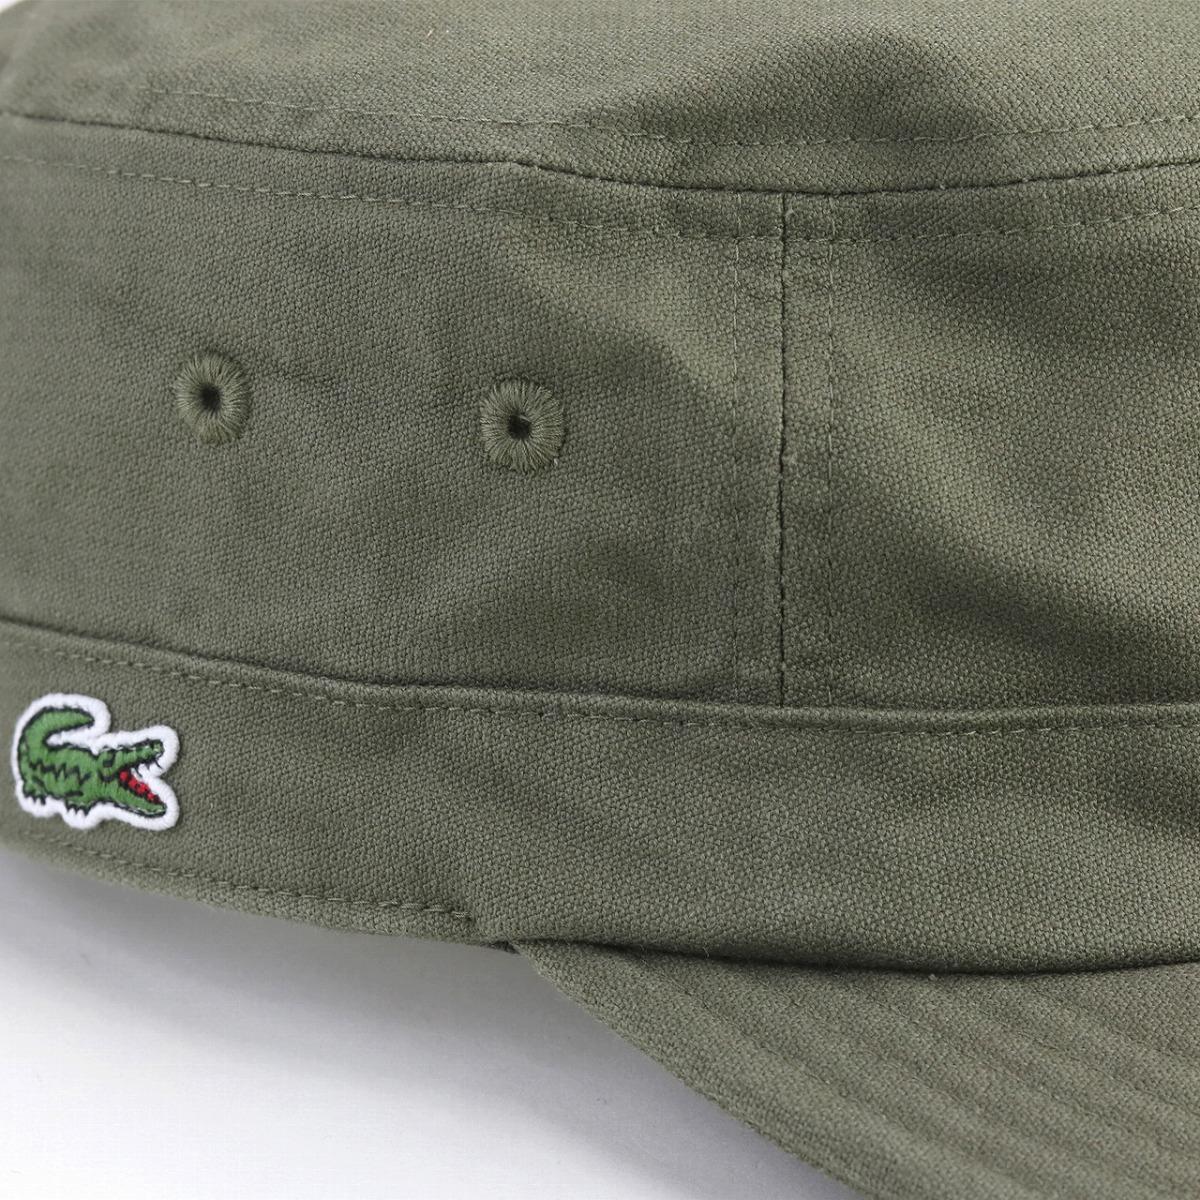 Shin pull plain fabric crocodile mark casual clothes 58cm military  coordinates / khaki [cadet cap] made in cap men Lacoste work cap hat